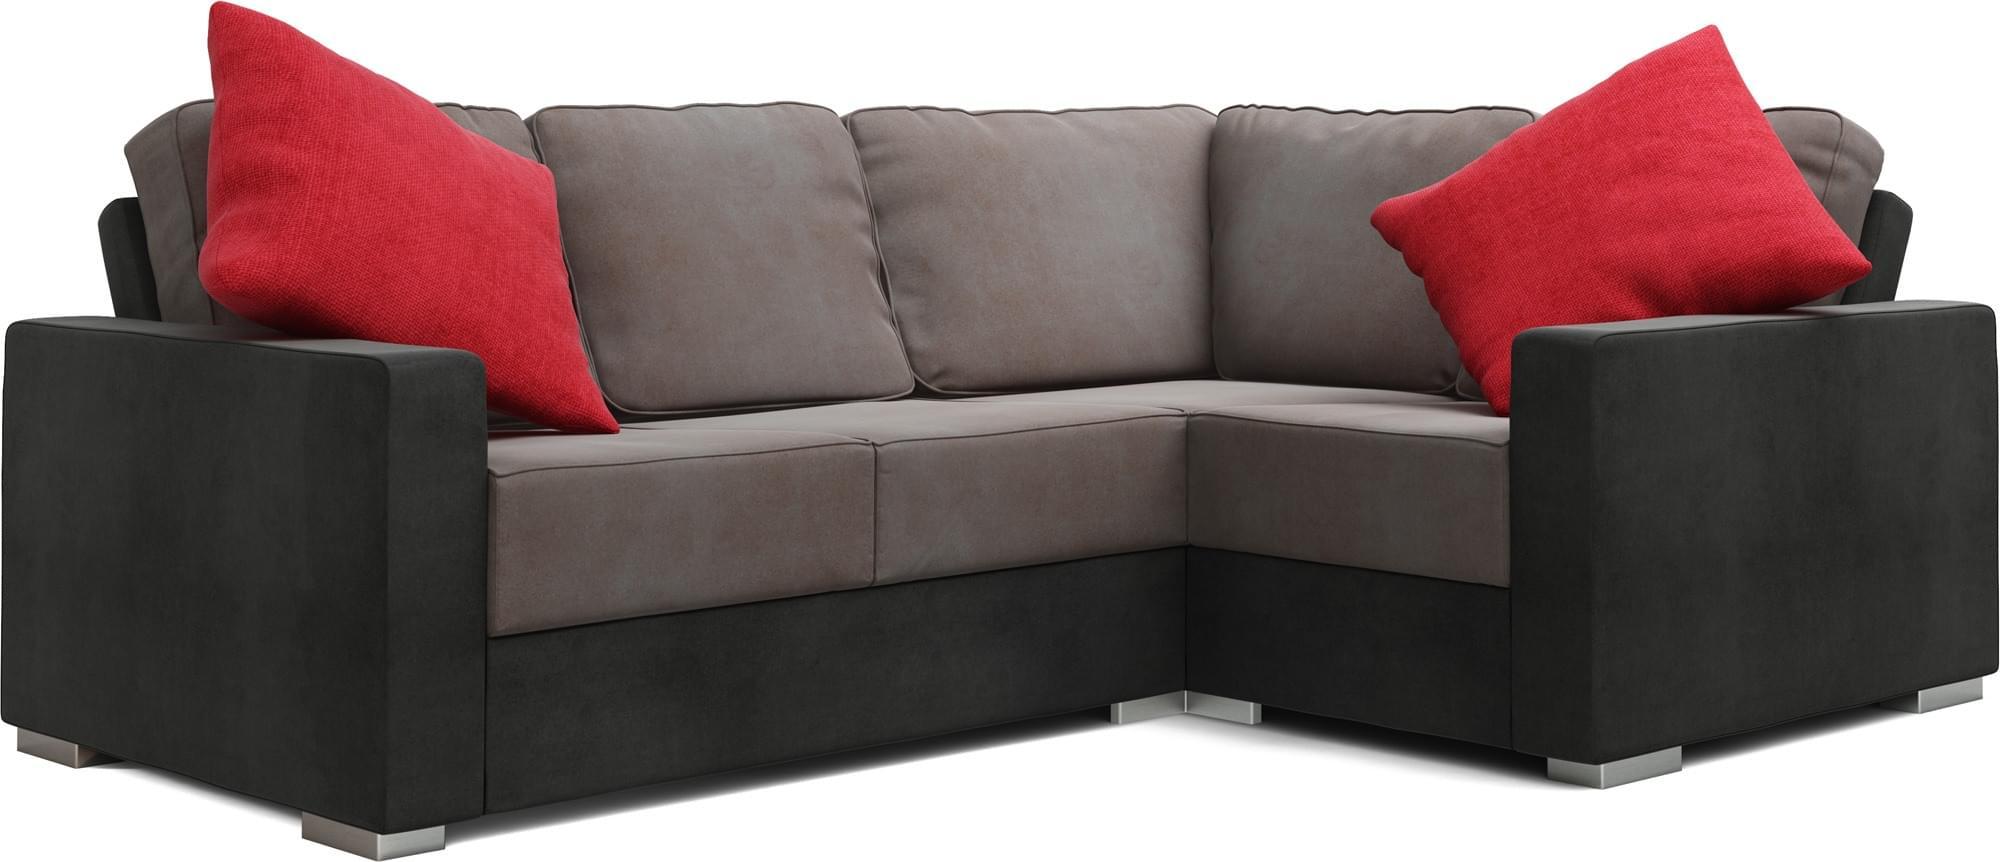 lear armless 3x2 l shaped sofa bed nabru. Black Bedroom Furniture Sets. Home Design Ideas